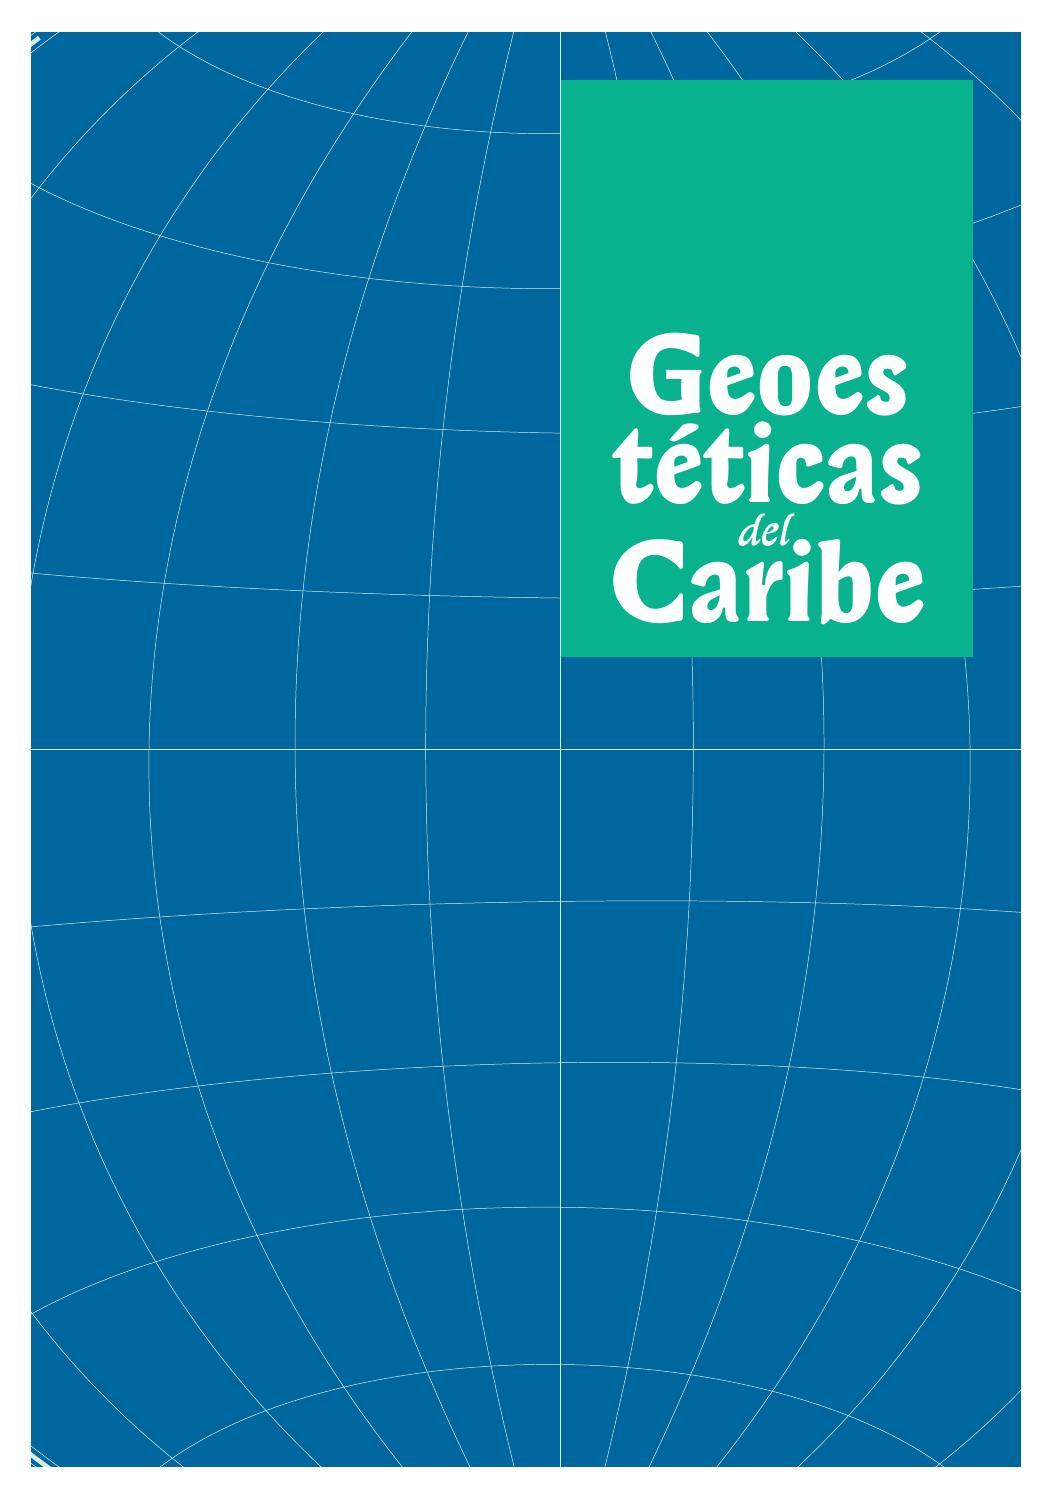 8e3a32327b0f7 Geoestéticas del caribe by Artes Visuales Mincultura - issuu